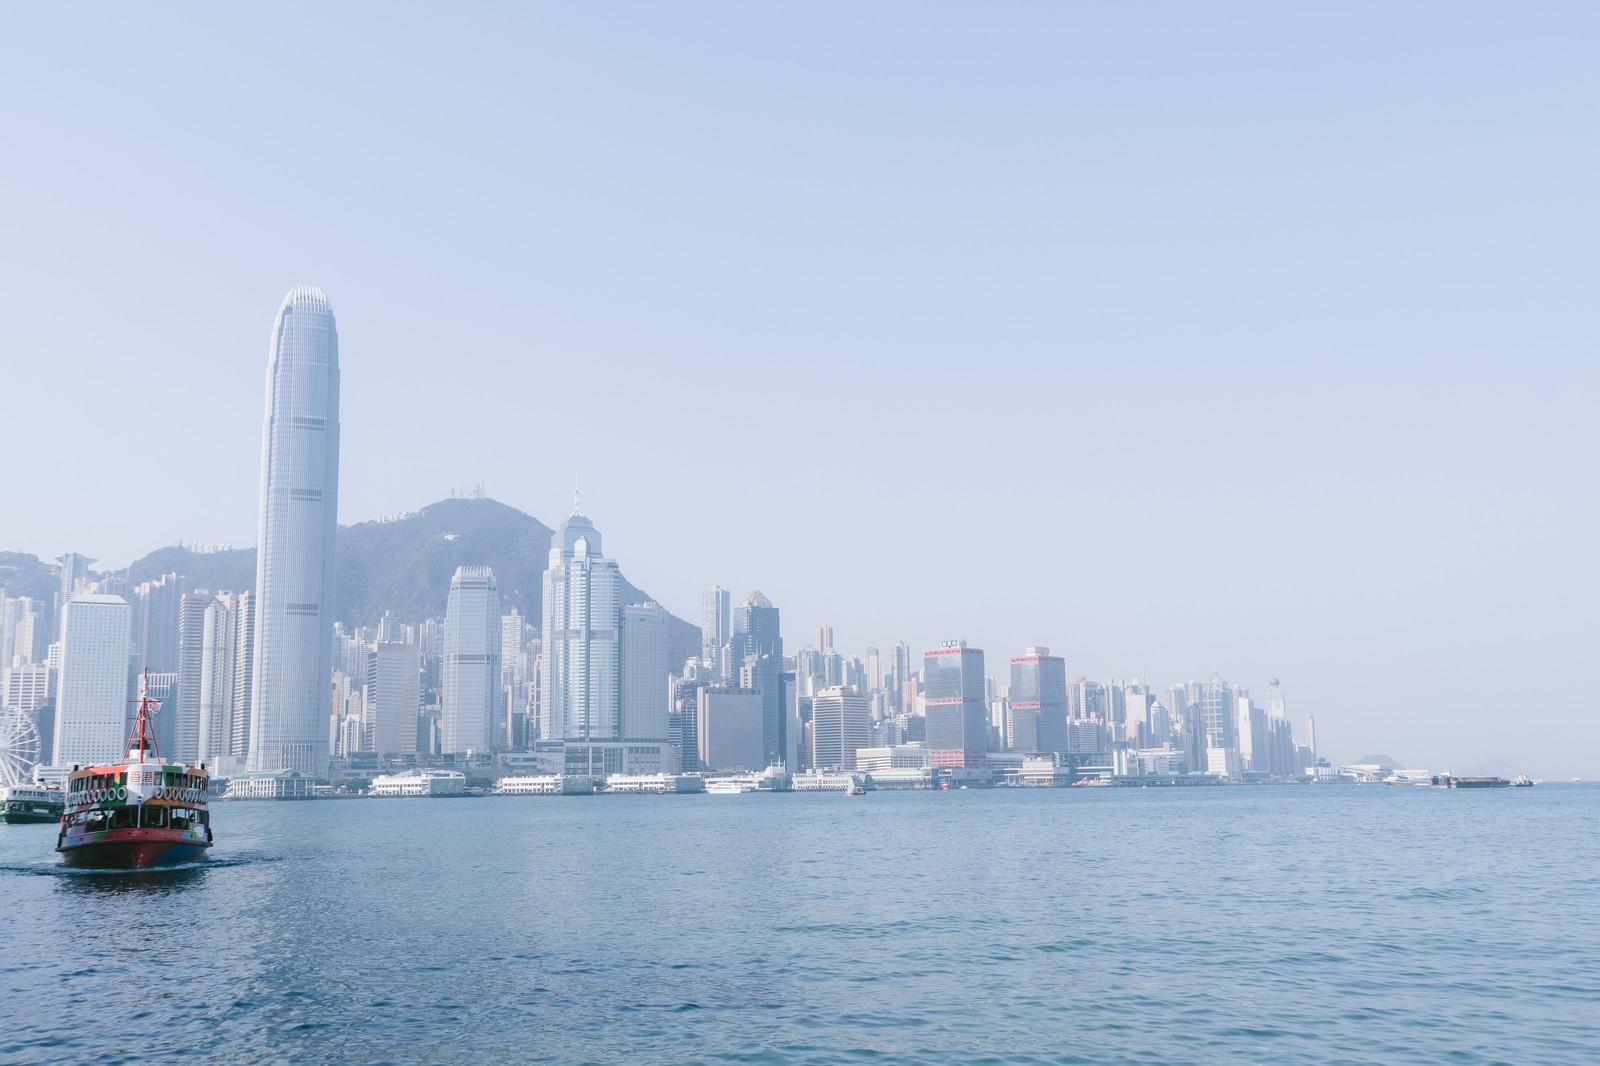 hongkongDSC04754 TP V - 【ニュース】11月11日は何の日だった?独身の日でアリババ最高益達成に見る中国の今